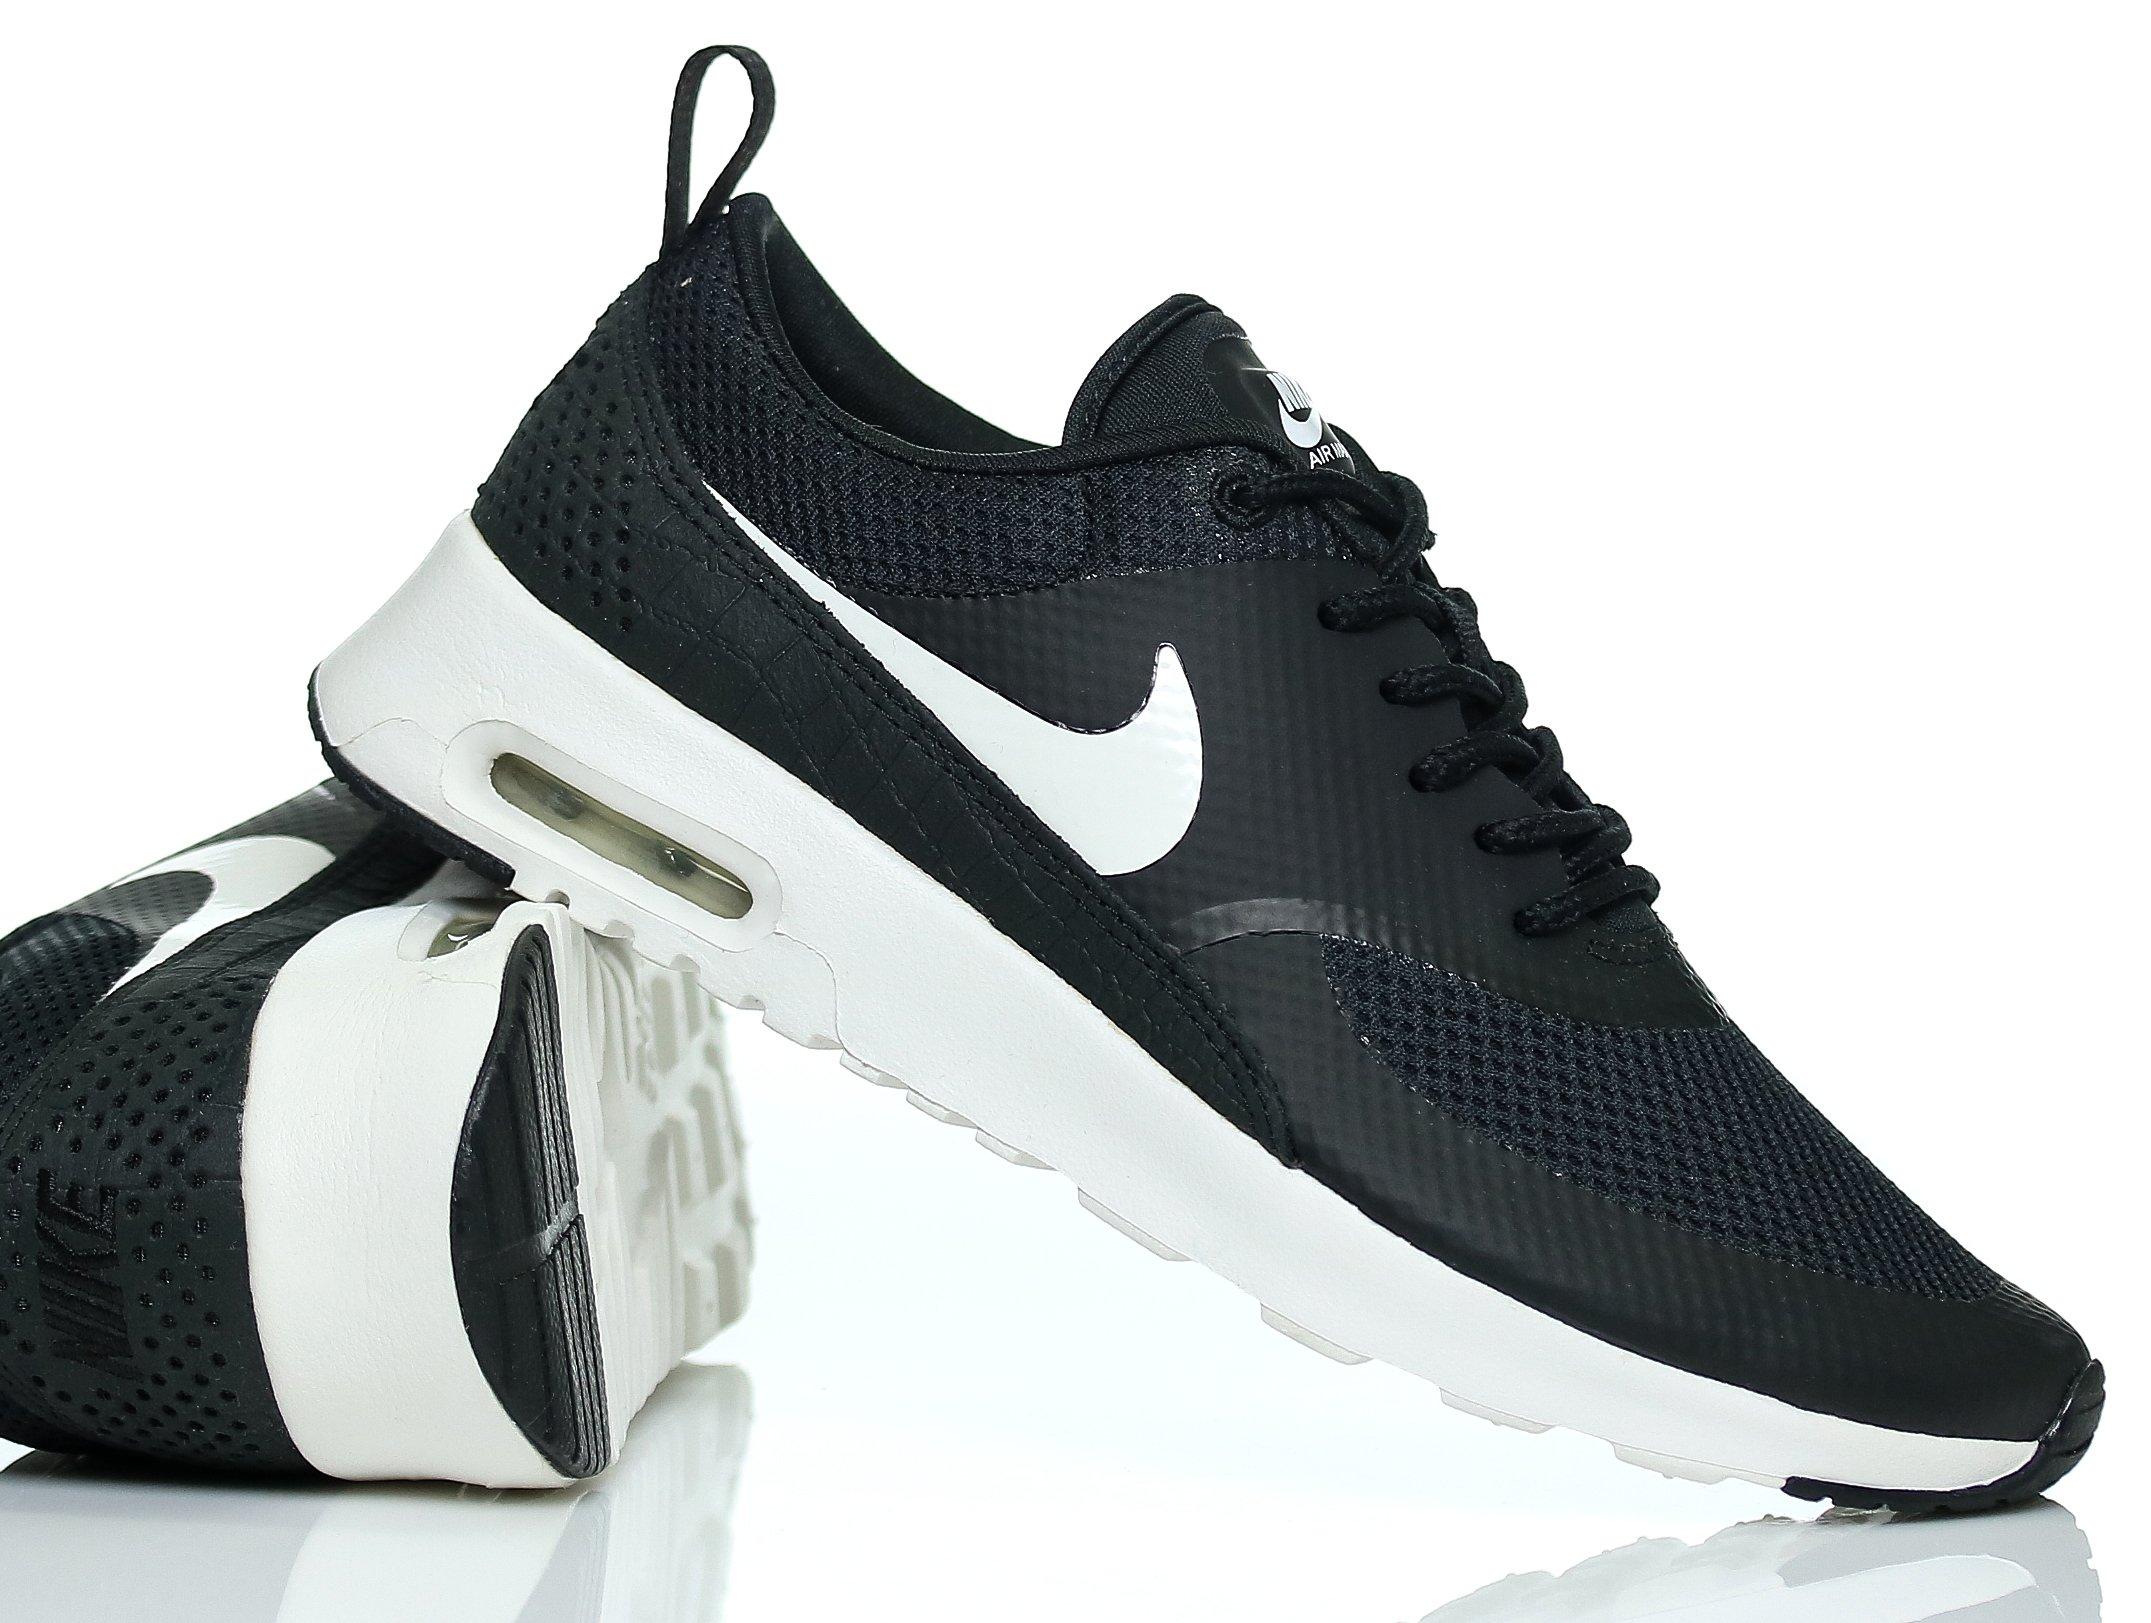 sports shoes 57e39 d22e4 Buty damskie Nike Air Max Thea 599409-020 7580250114 - Allegro.pl